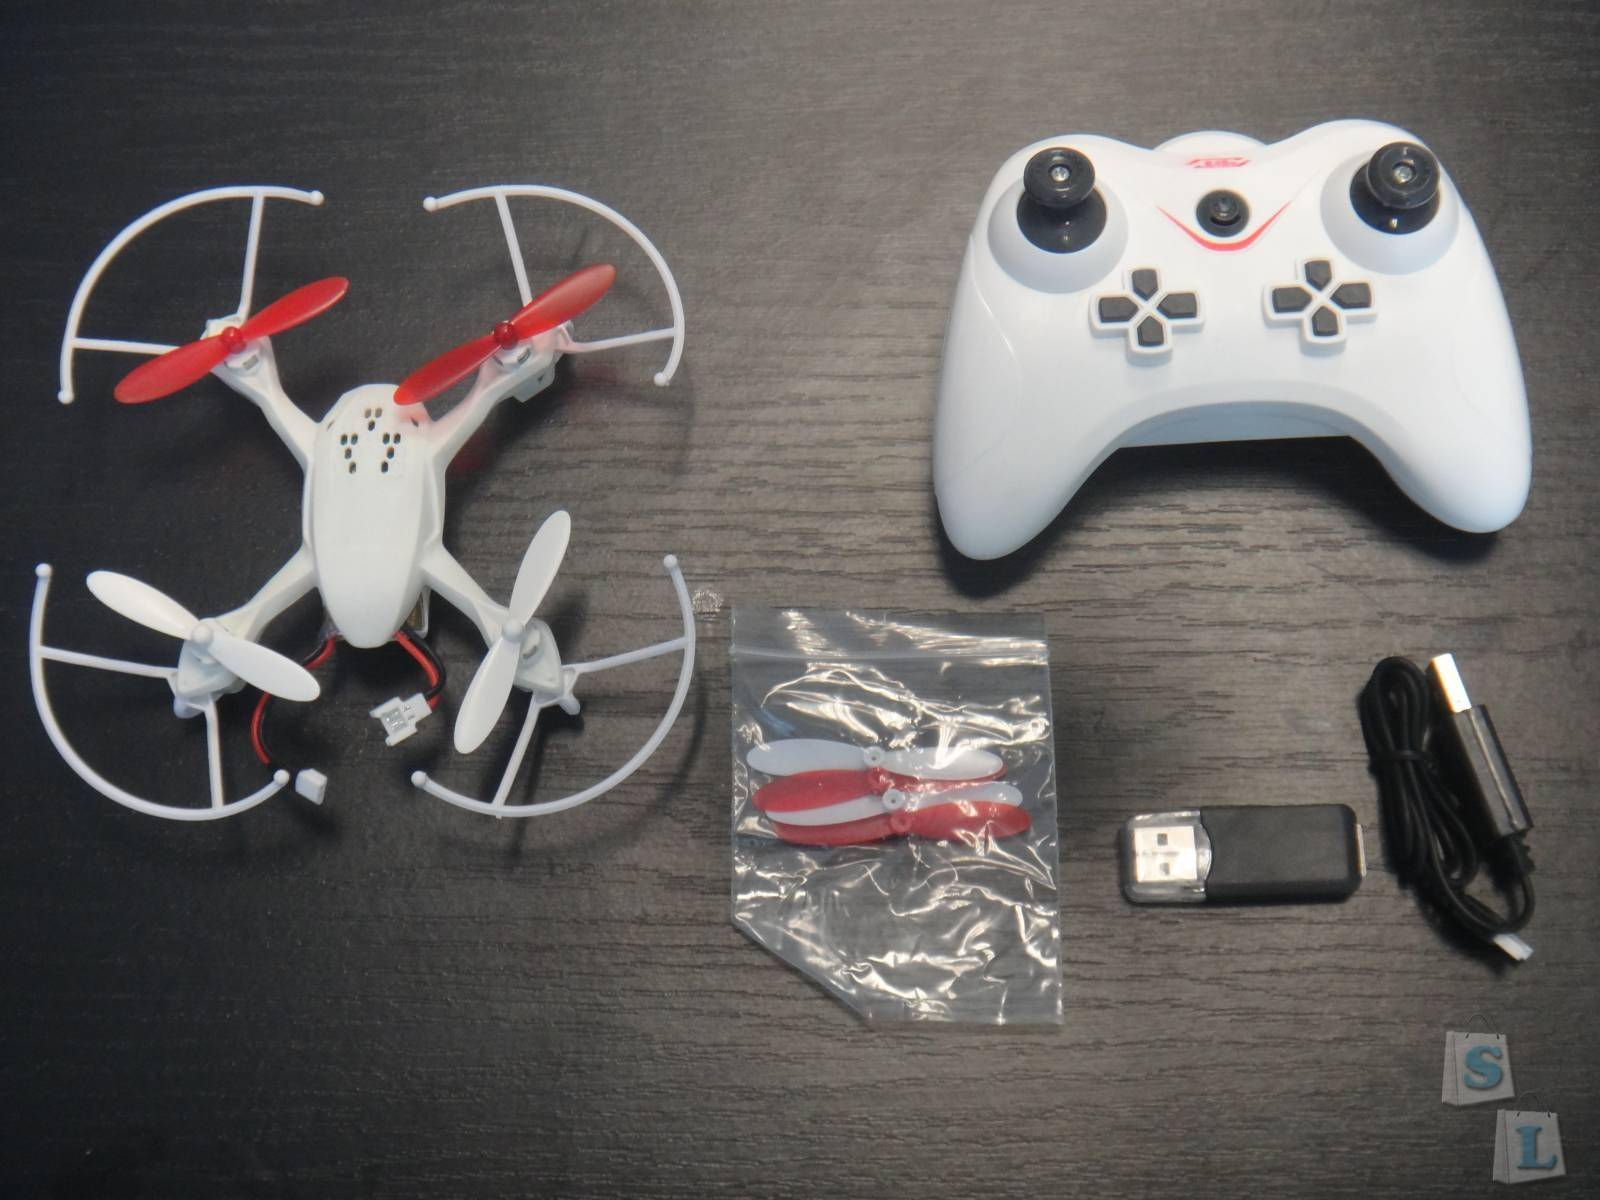 TVC-Mall: Квадракоптер JY001 копия Hubsan H107D с 2,0 Мп камерой, Headless режимом и возвратом к пульту